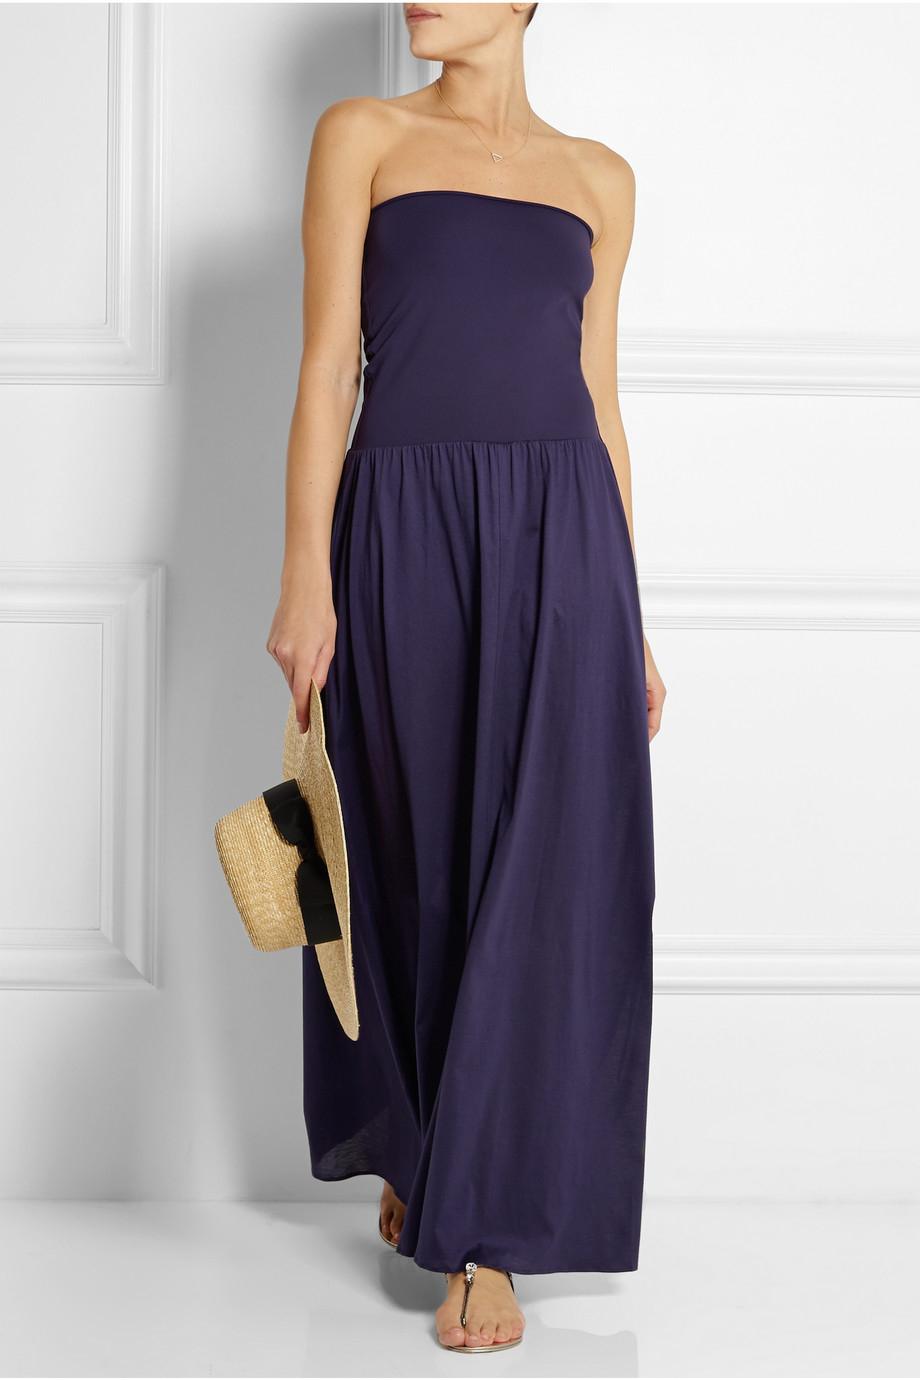 6bc8d7acfd7 Eres Zephyr Ankara Cotton-Jersey Maxi Dress in Blue - Lyst